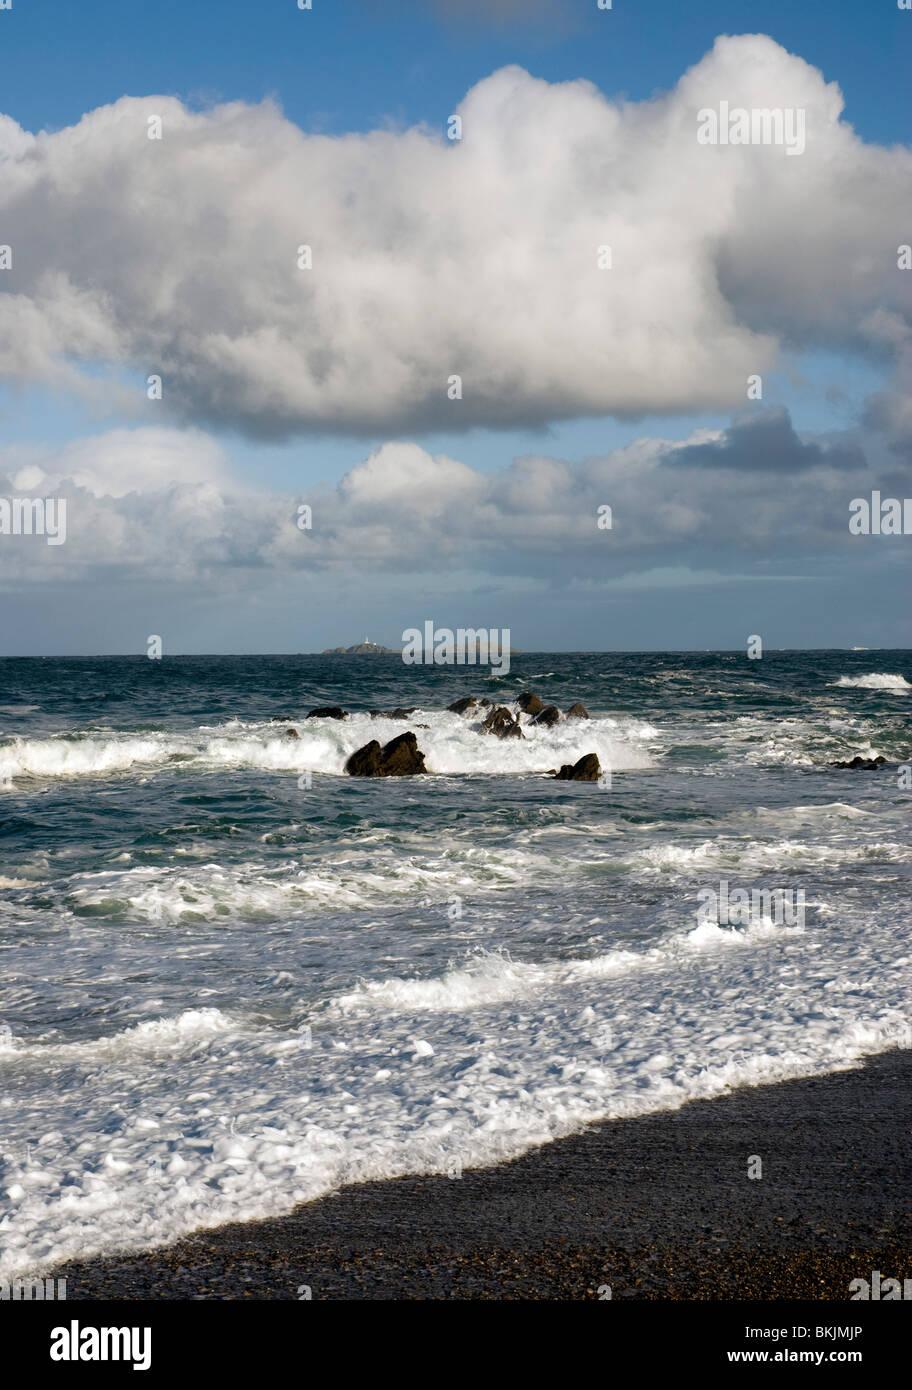 The Island of Inishtrahull off the North West coast of Ireland - Stock Image